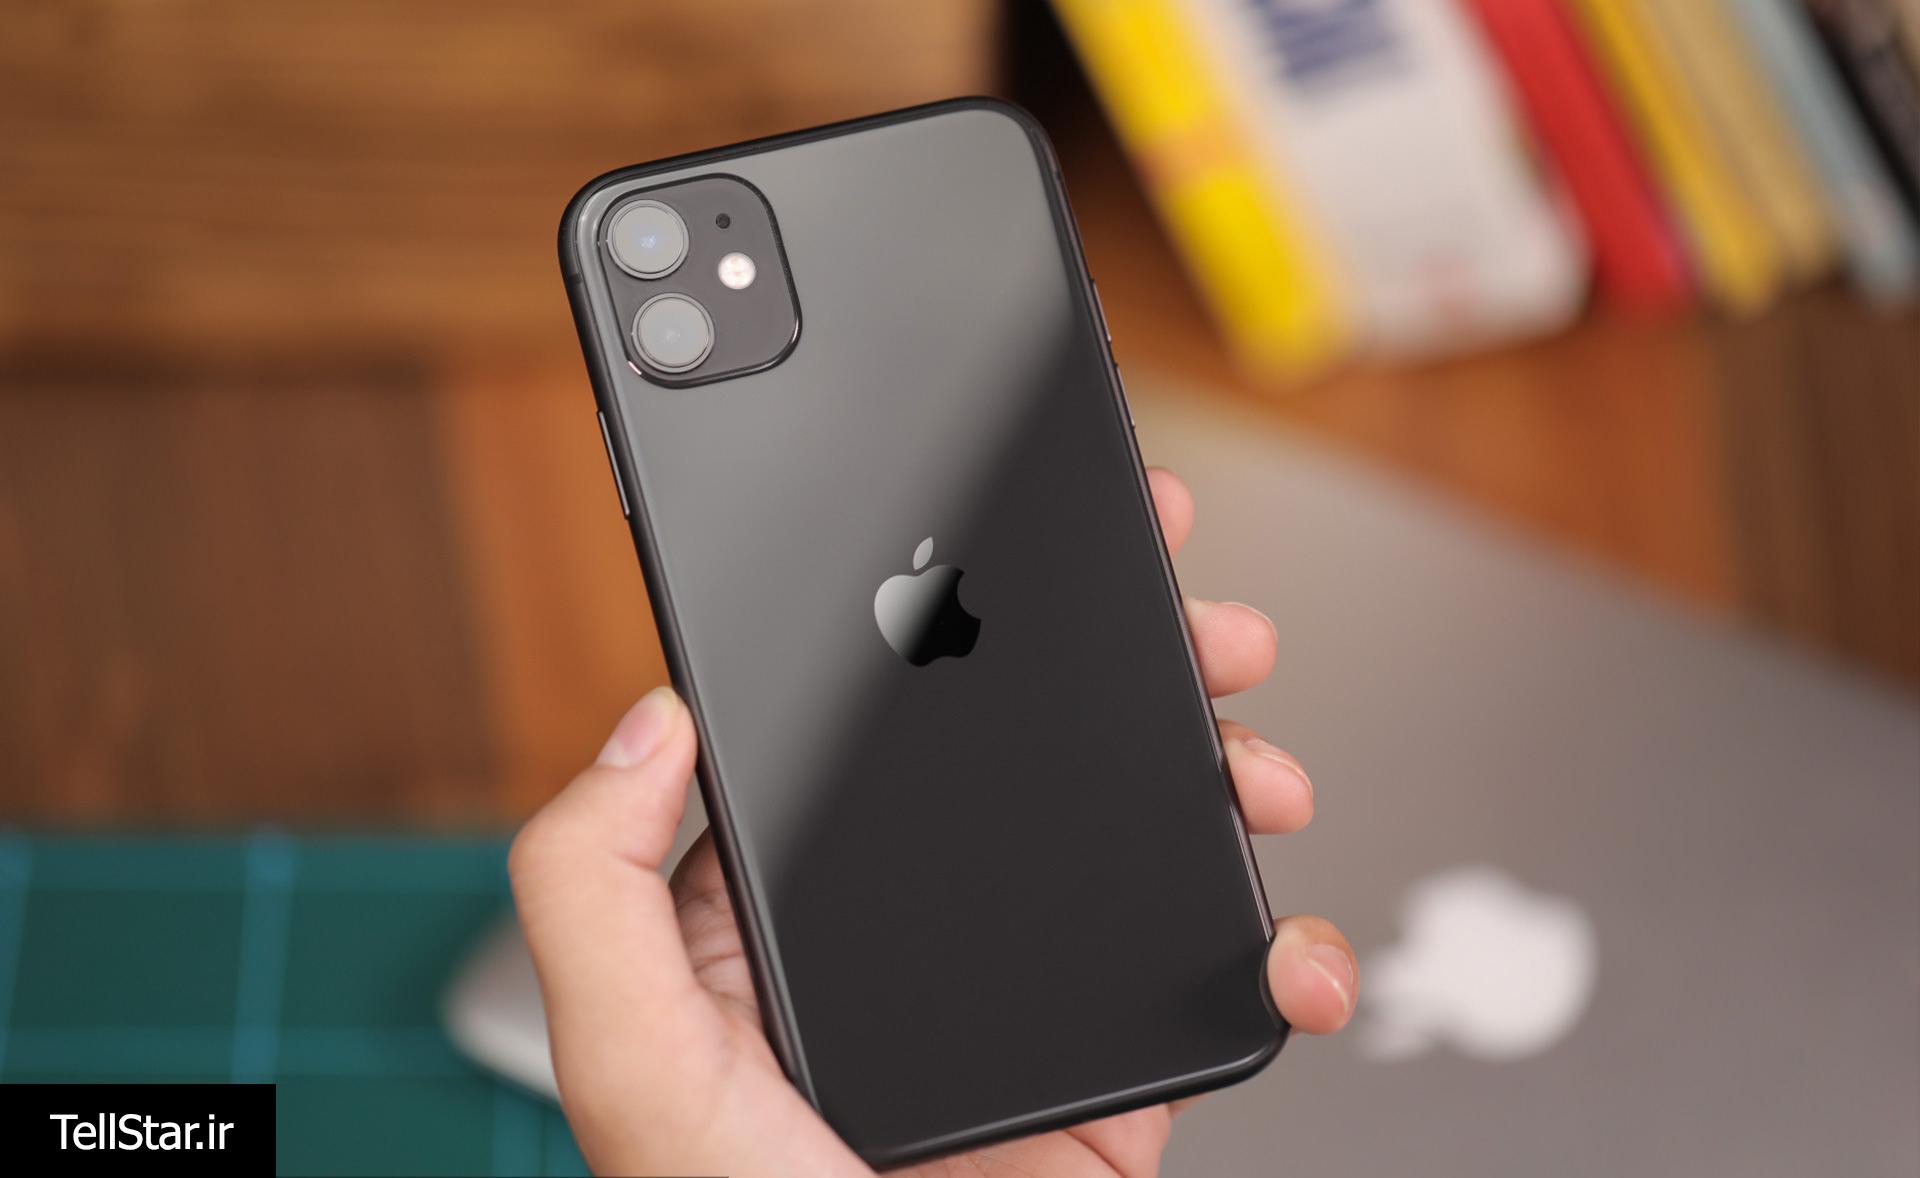 Apple iPhone 11 – 64GB – گوشی موبایل 11 اپل آیفون دو سیم کارت (پخش عمده)